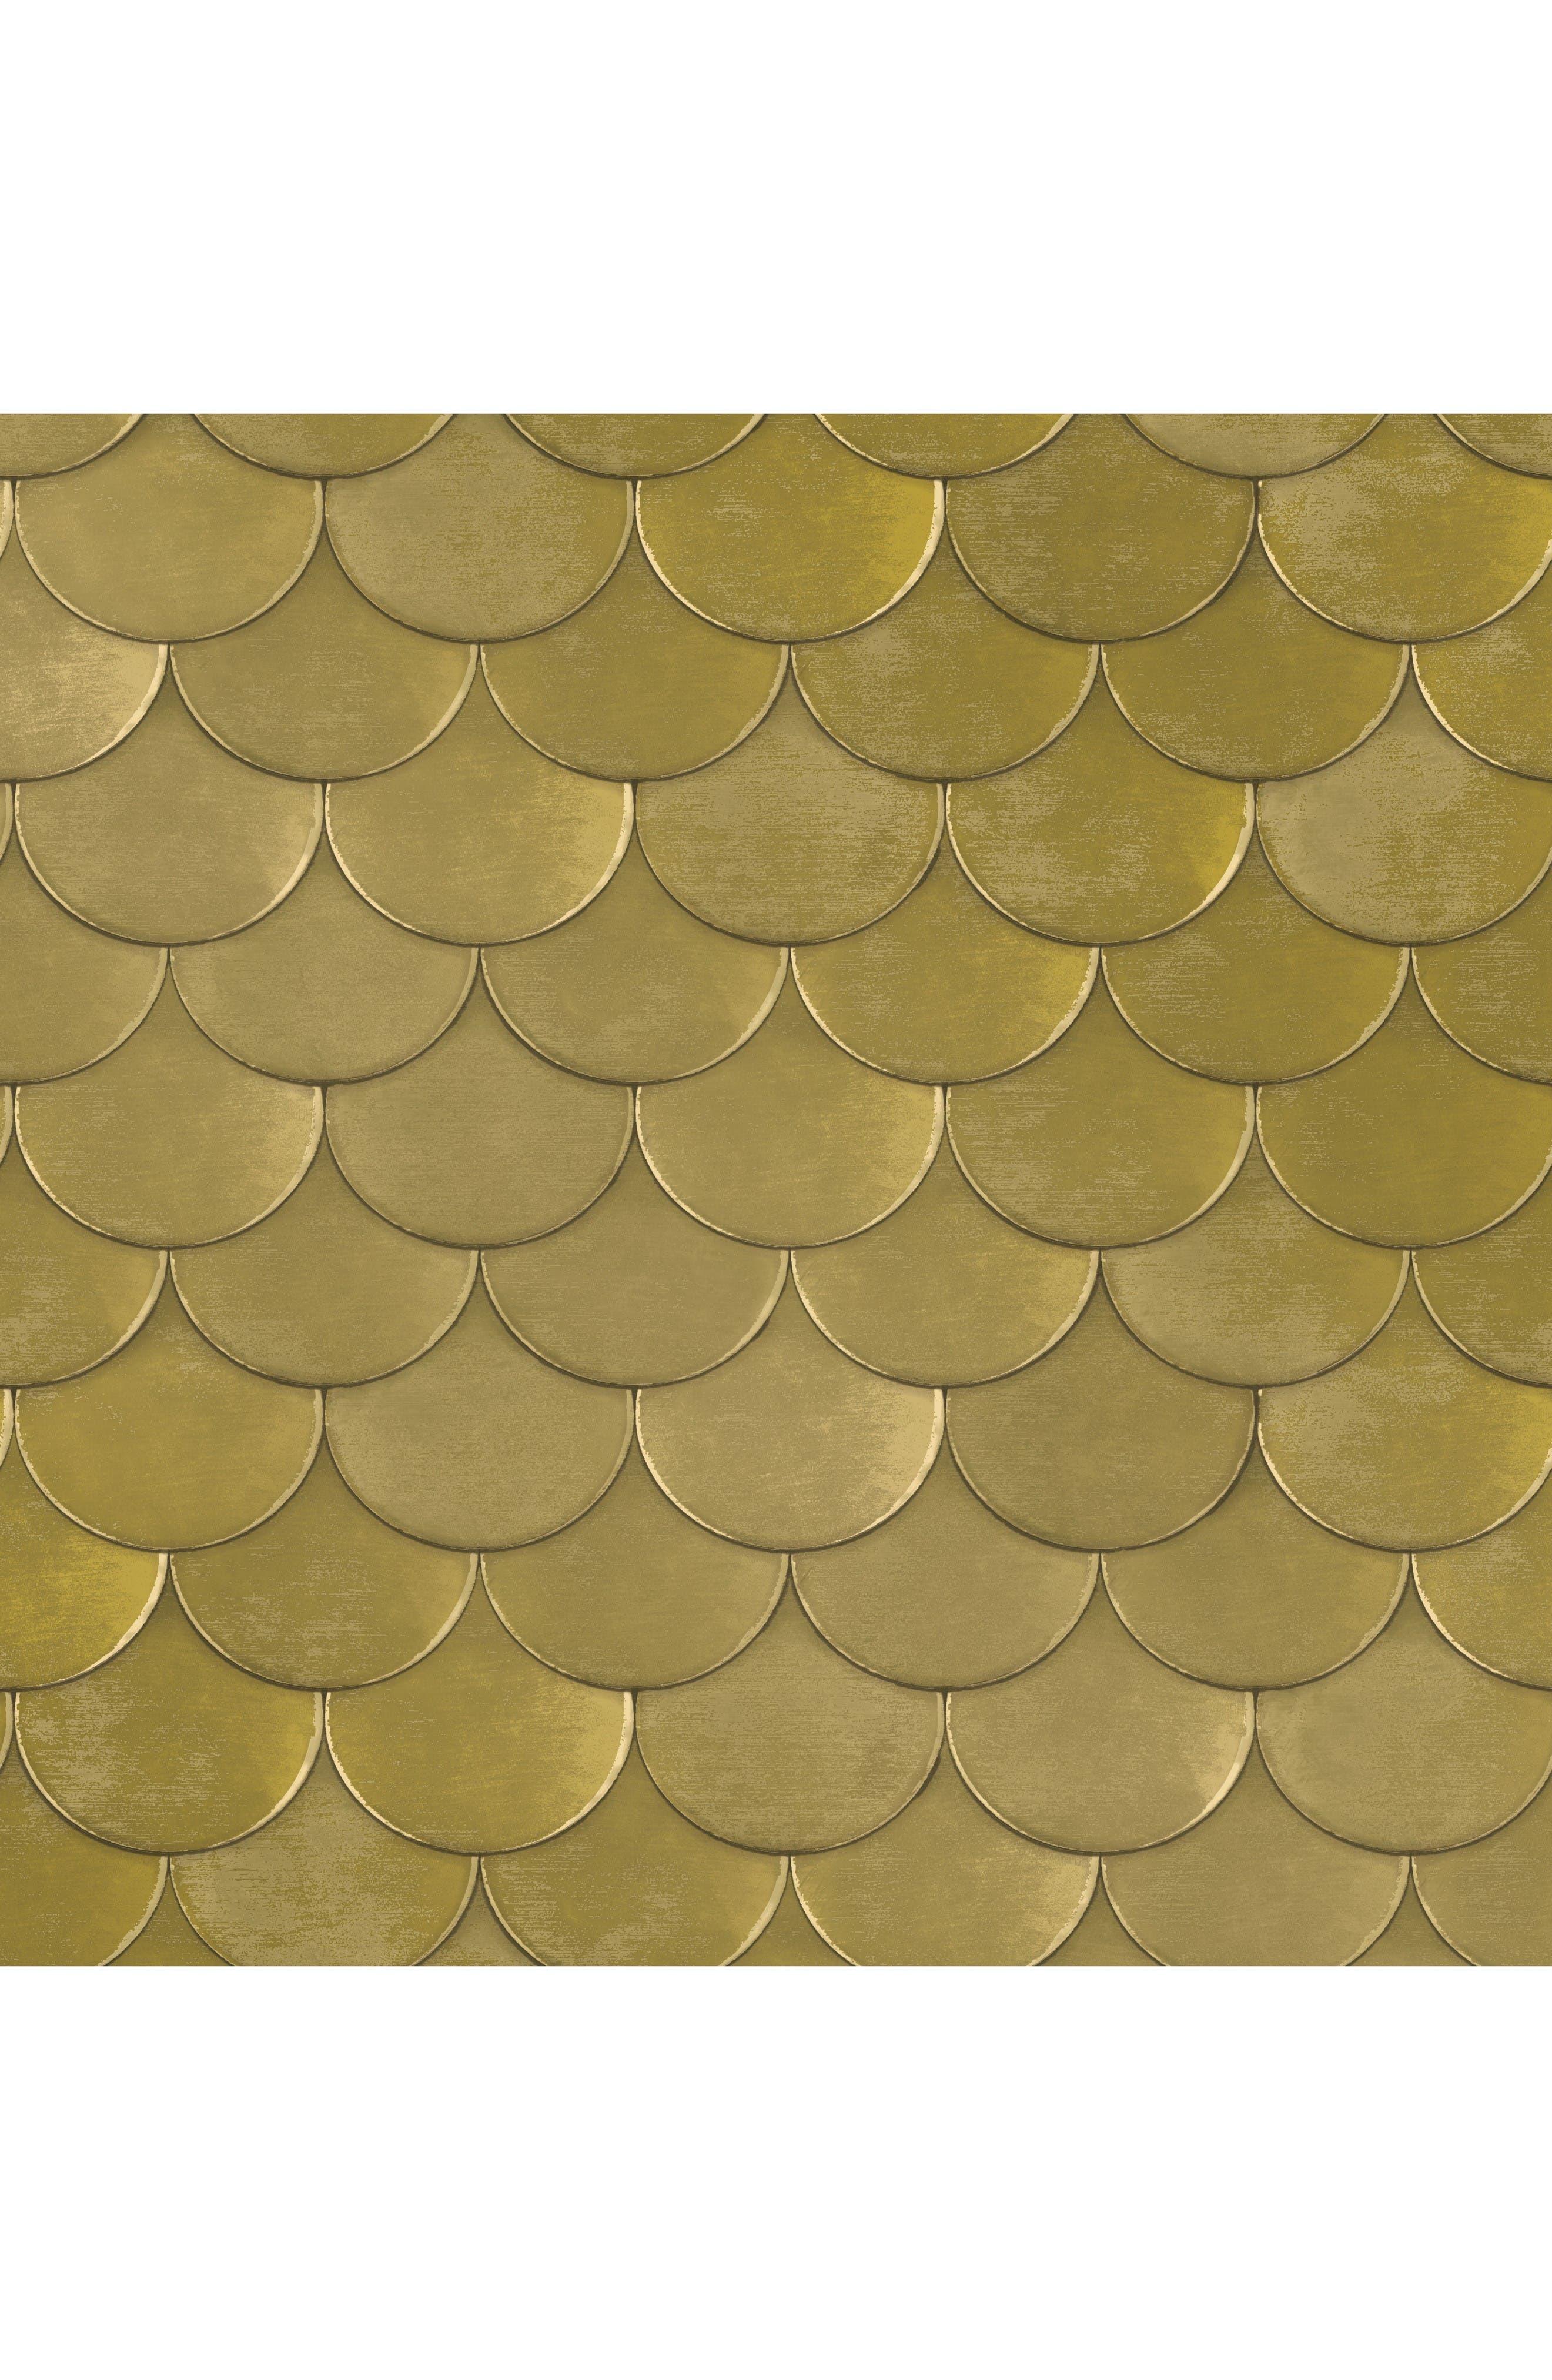 Brass Belly Self-Adhesive Vinyl Wallpaper,                             Main thumbnail 1, color,                             Metallic Gold